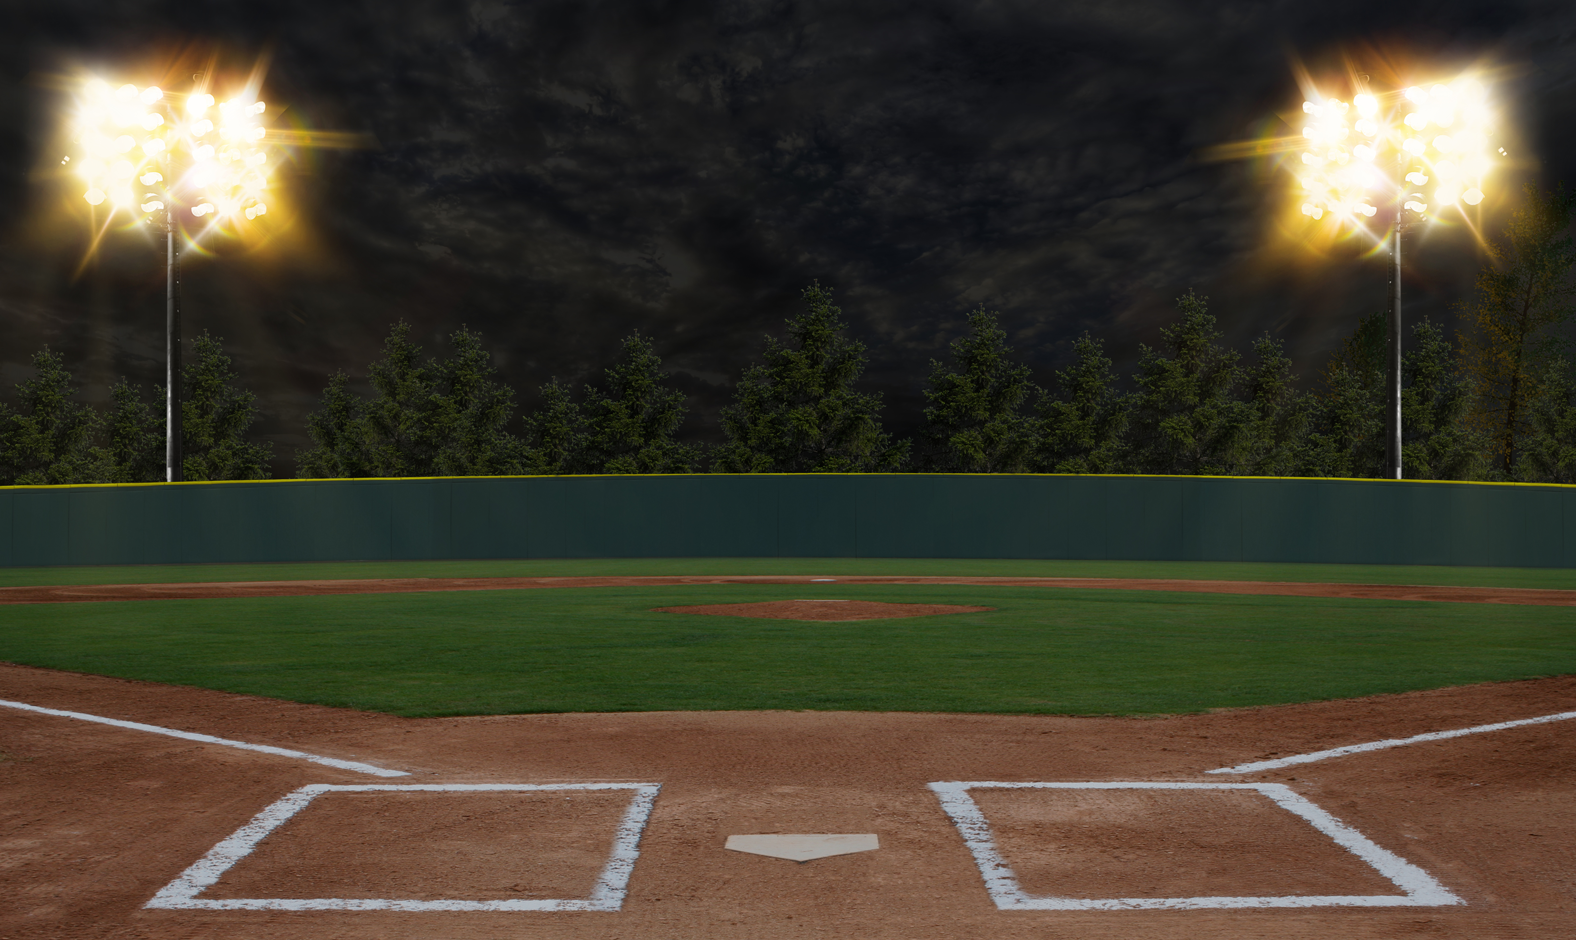 Https Gereports Prd S3 Amazonaws Com Wp Content Uploads 2016 04 Jays Lights Ge Report Png Baseball Stadium Baseball Field Photography Backdrops